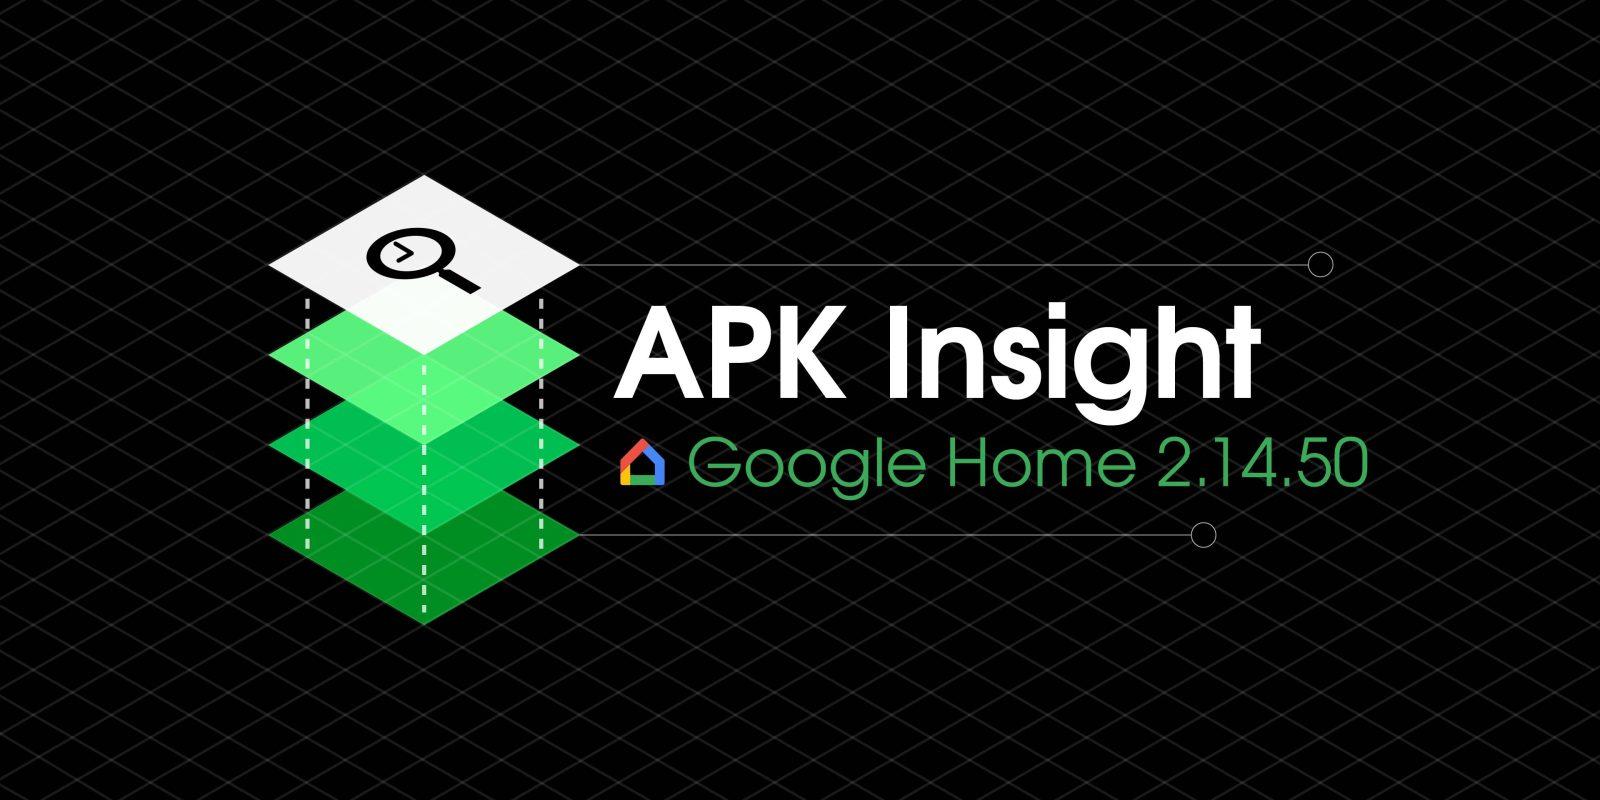 Google Home 2.14.50 confirms 'Nest Mini' and references Stadia [APK Insight]